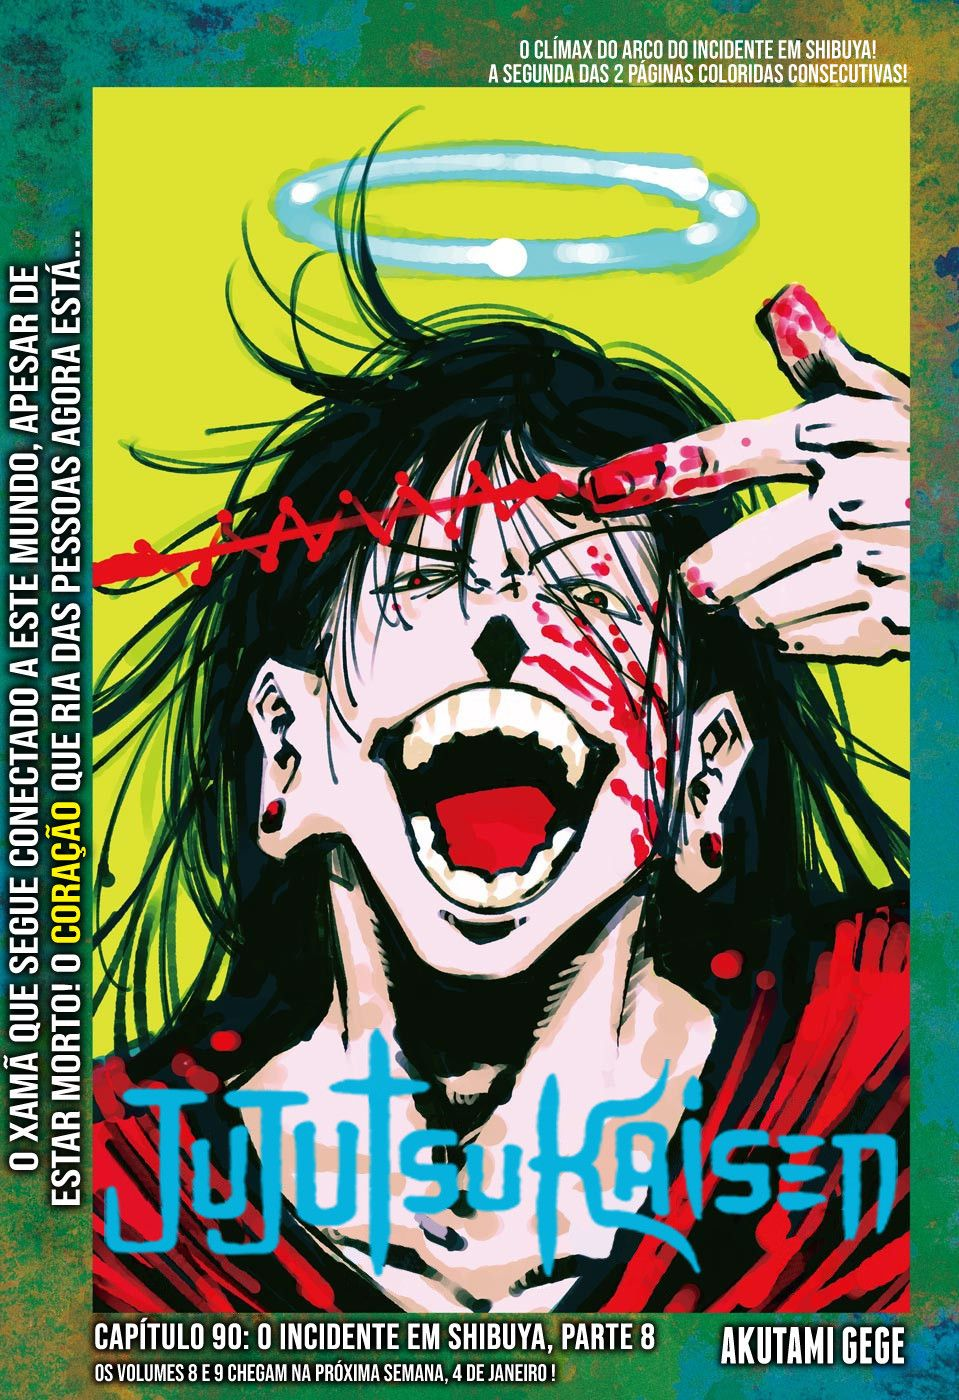 Jujutsu Kaisen Geto Jujutsu Manga Covers Anime Wall Art